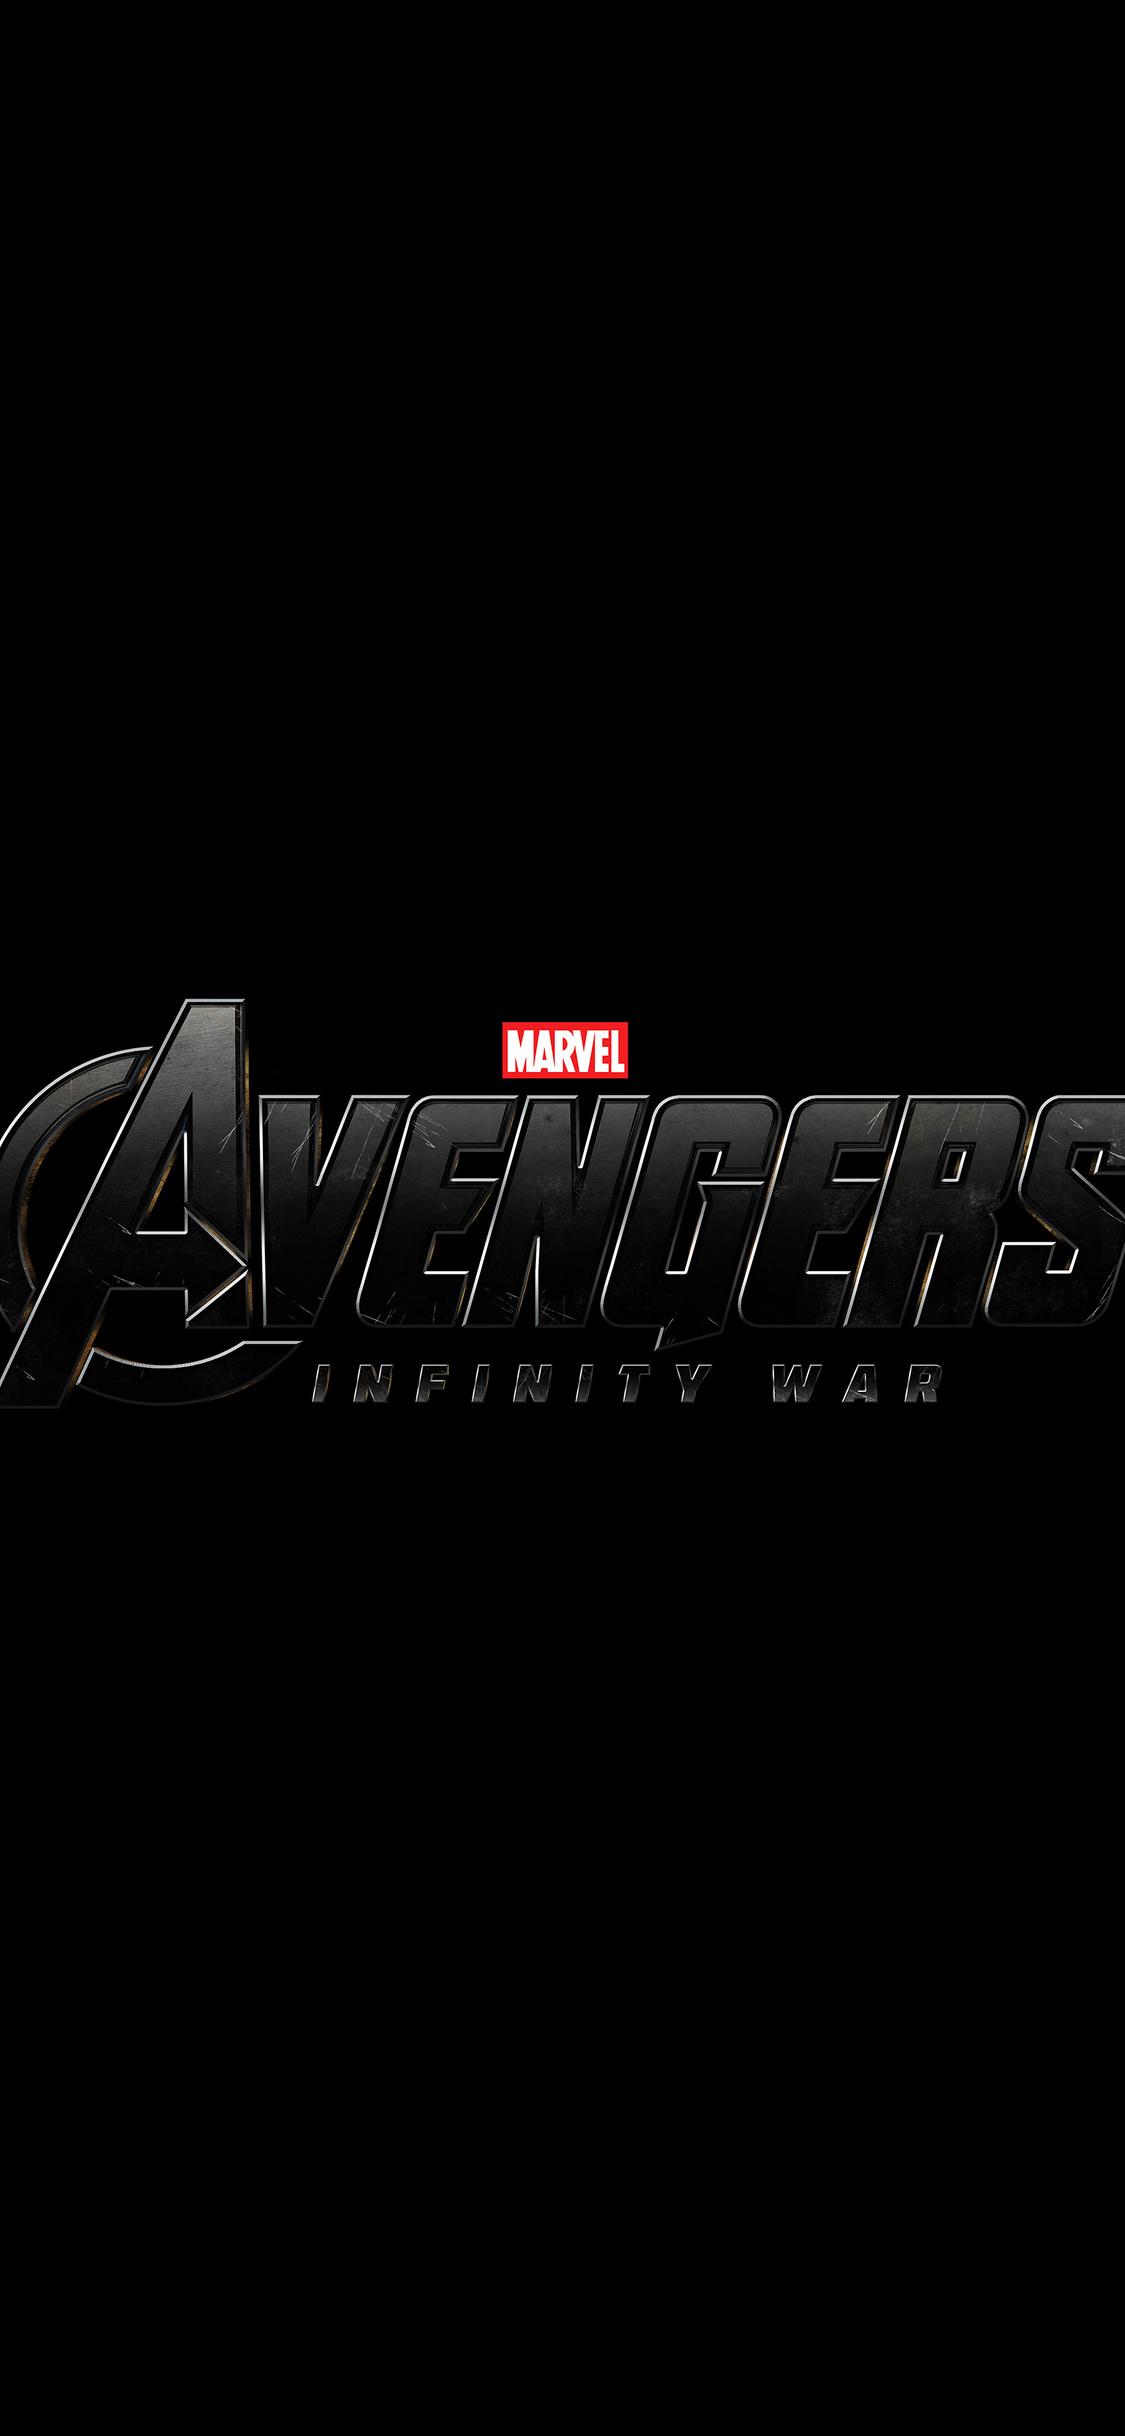 1125x2436 Avengers Infinity War 2018 Logo Iphone Xs Iphone